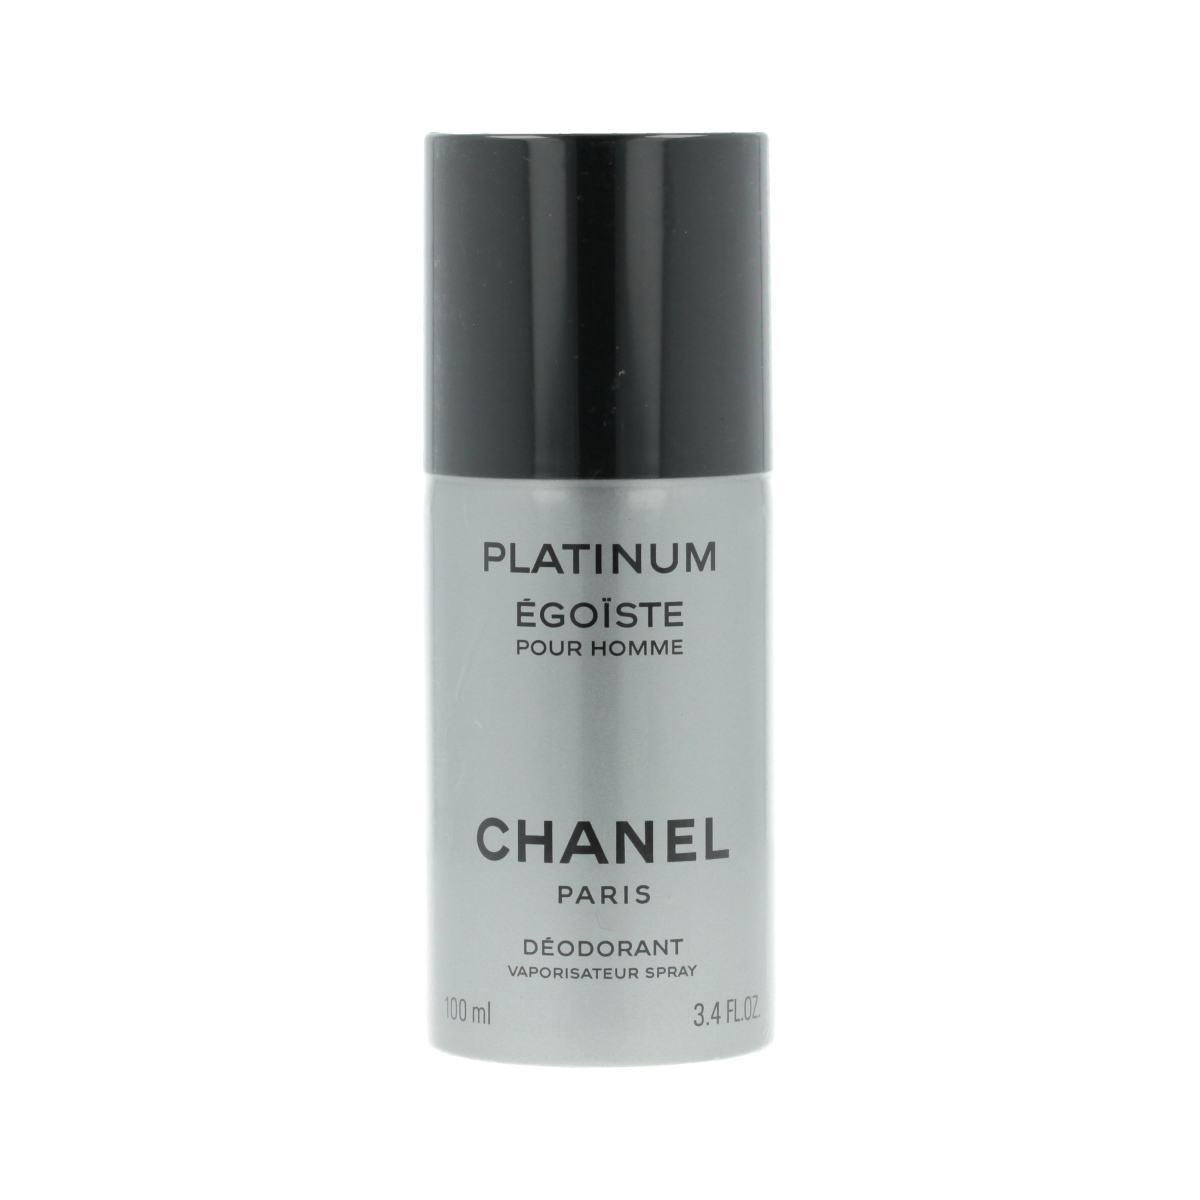 Chanel Egoiste Platinum Pour Homme Deodorant im Spray 100 ml (man) 58156